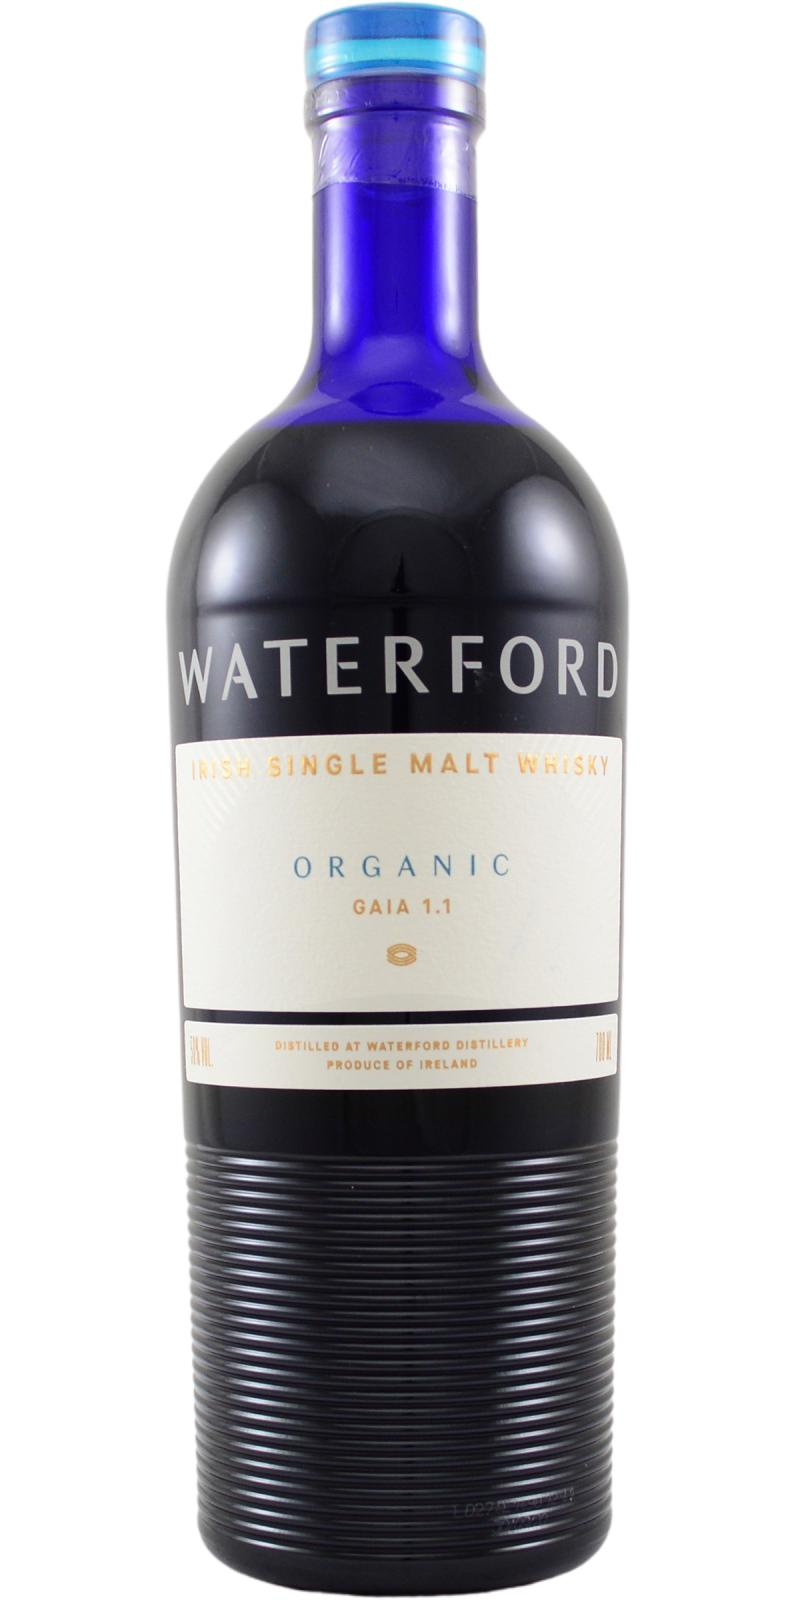 Waterford Gaia: Edition 1.1